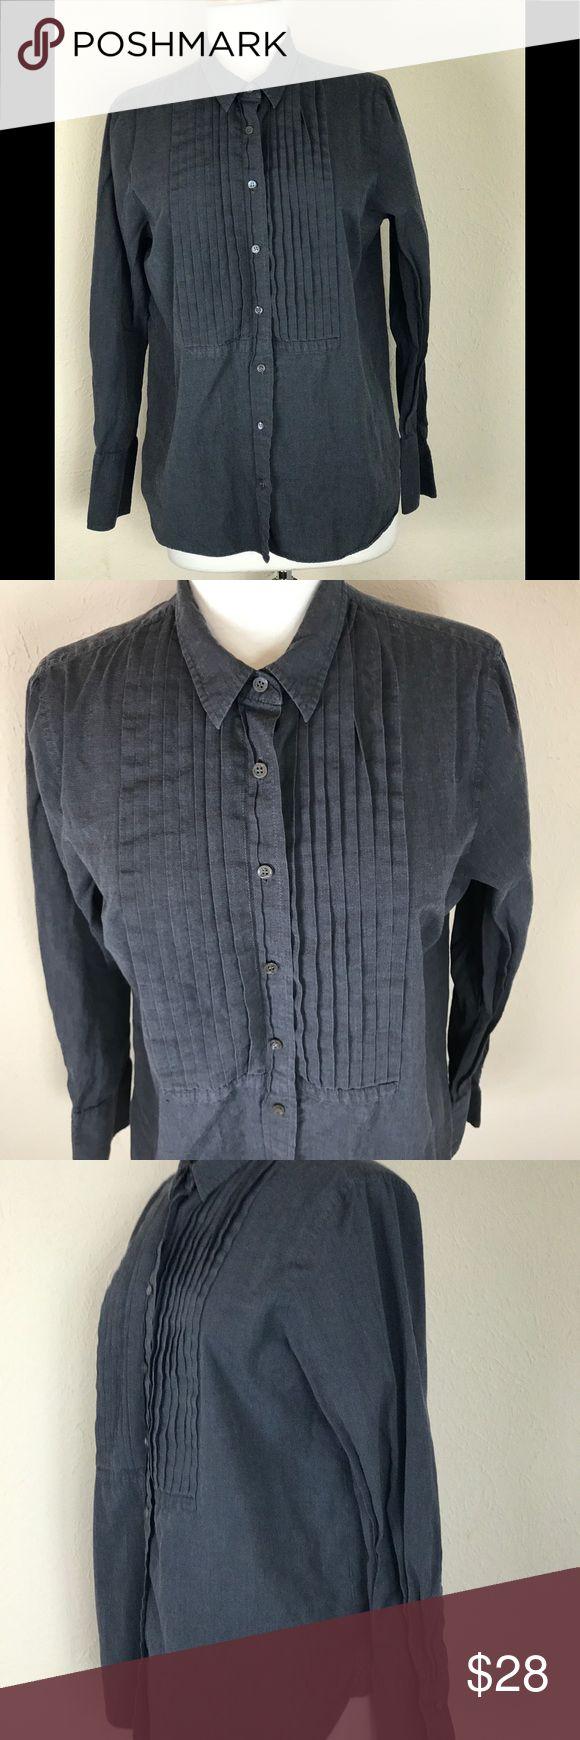 ♻️ J Crew Woman's Button down tuxedo Long Sleeve J crew TuxedoLong sleeve shirt Size 10 Navy Blue Great Condition J Crew Tops Button Down Shirts